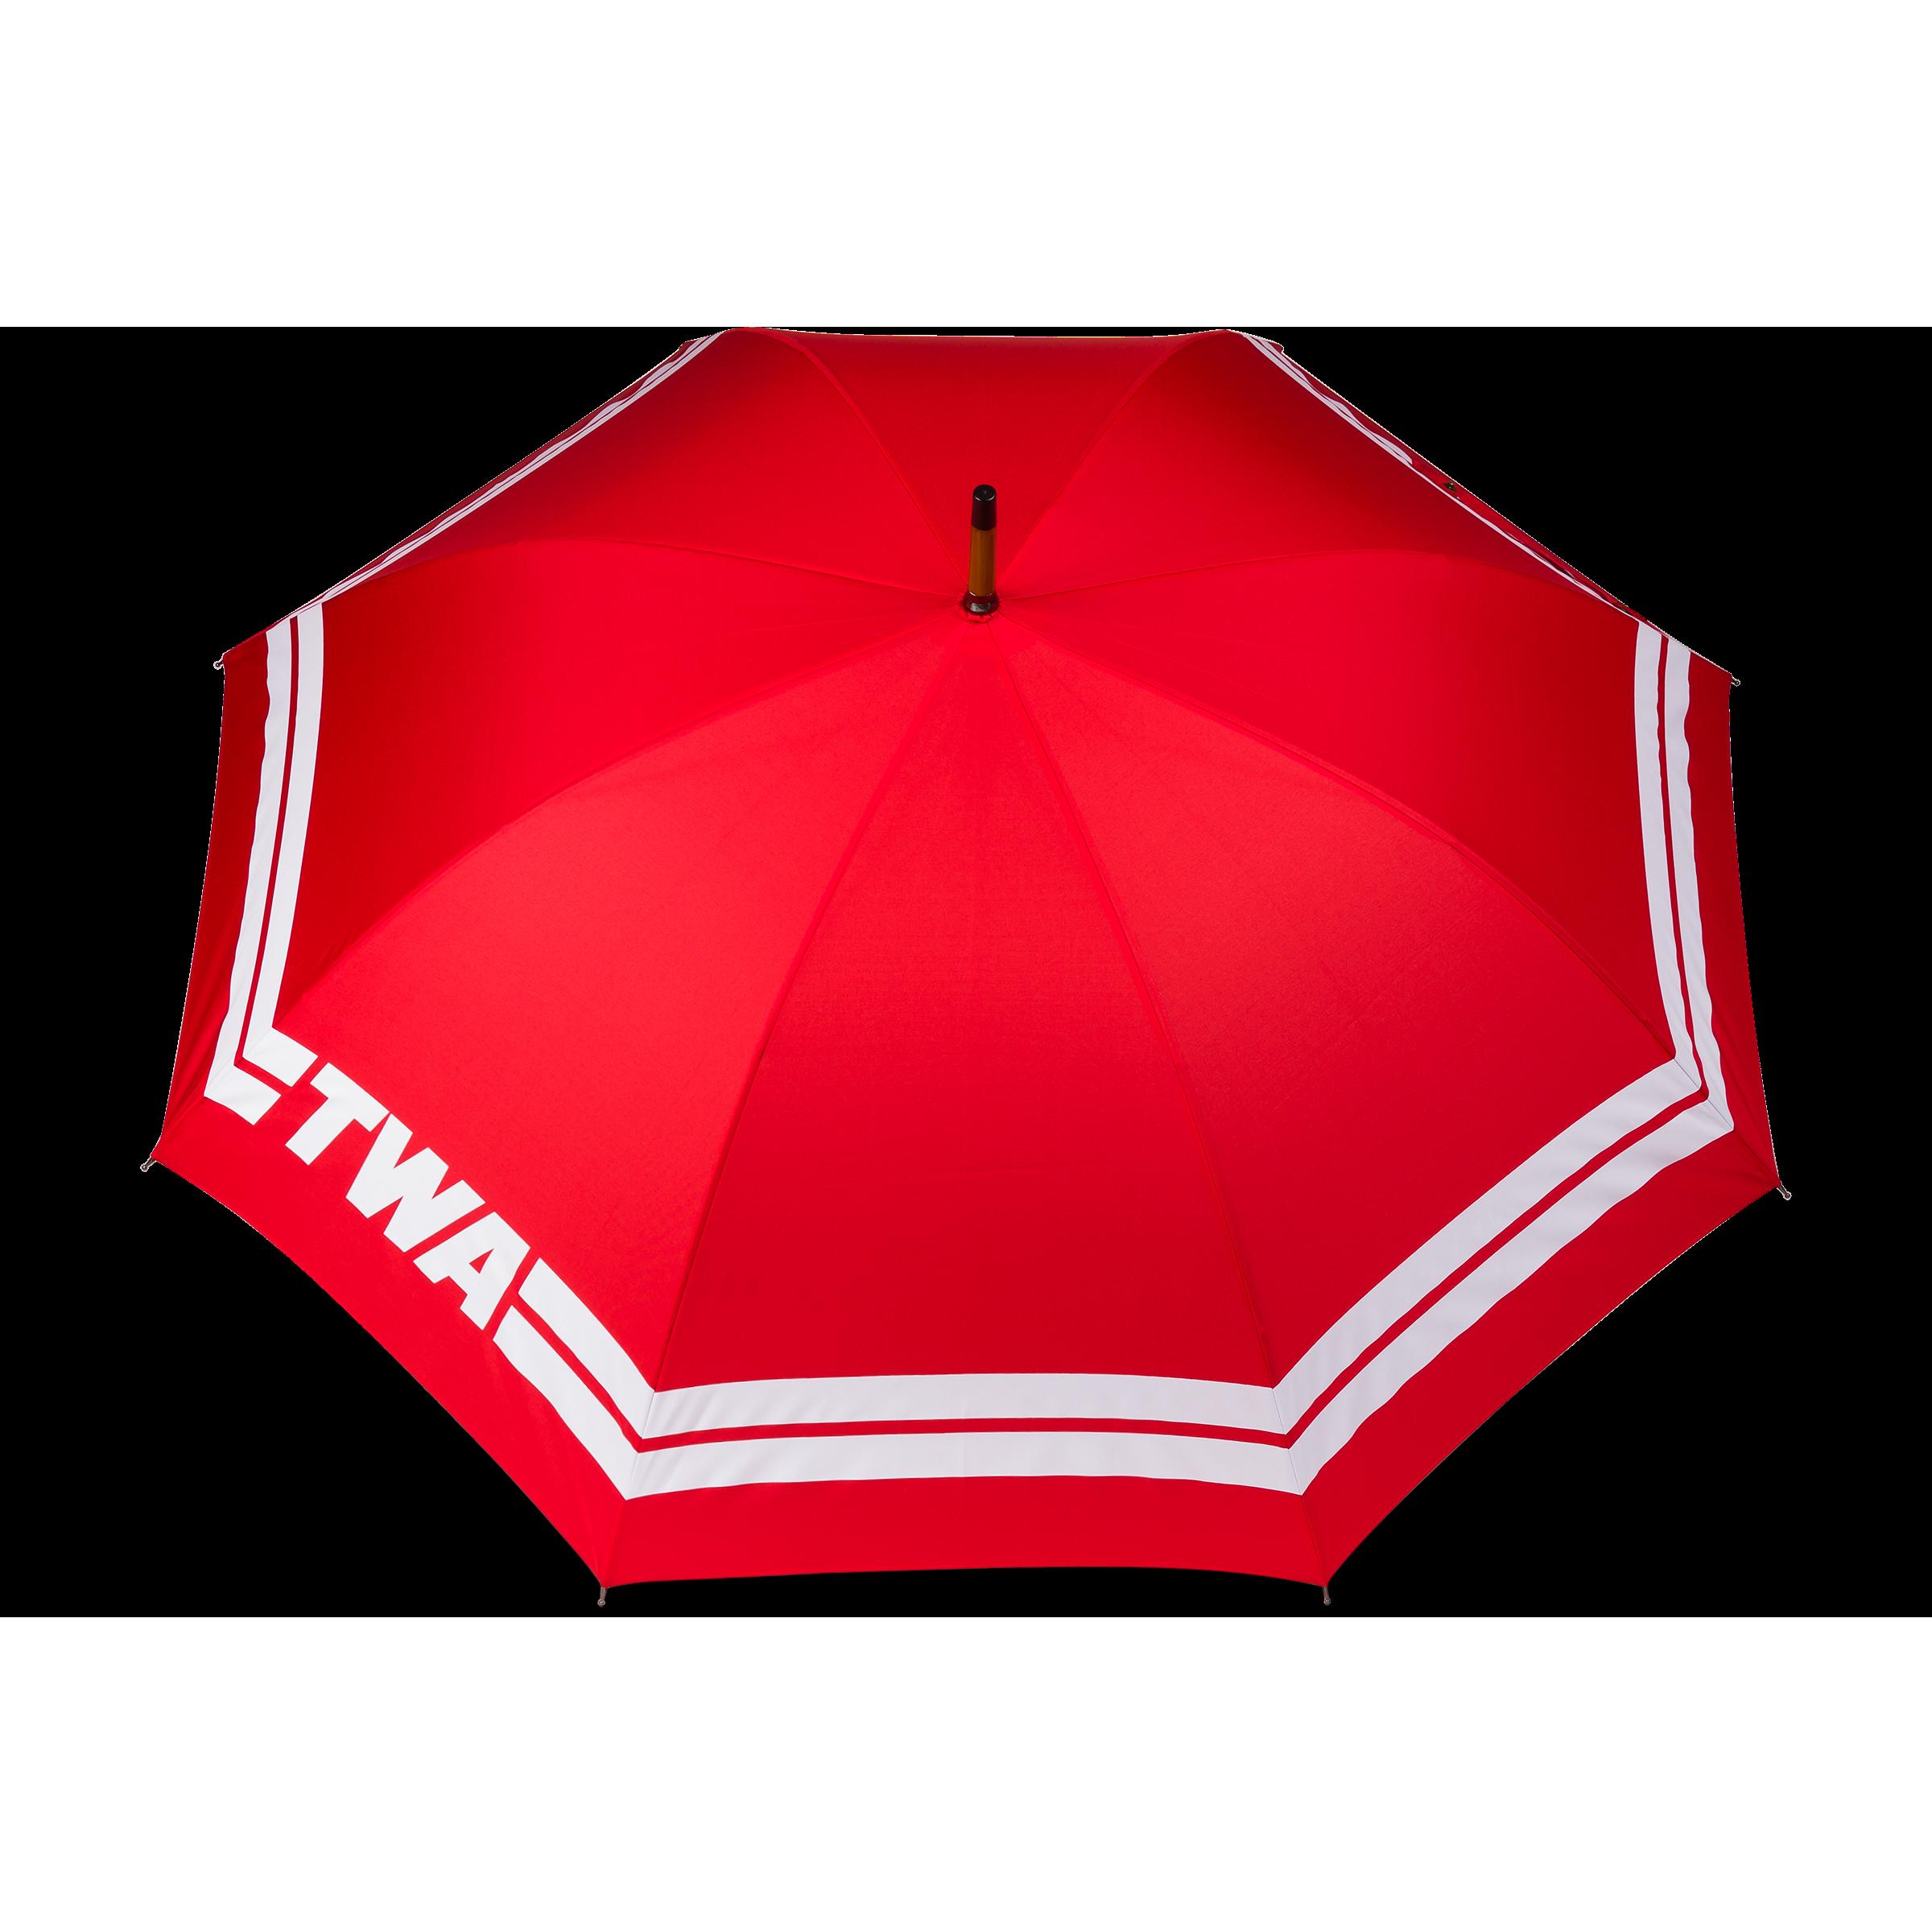 Red umbrella product image